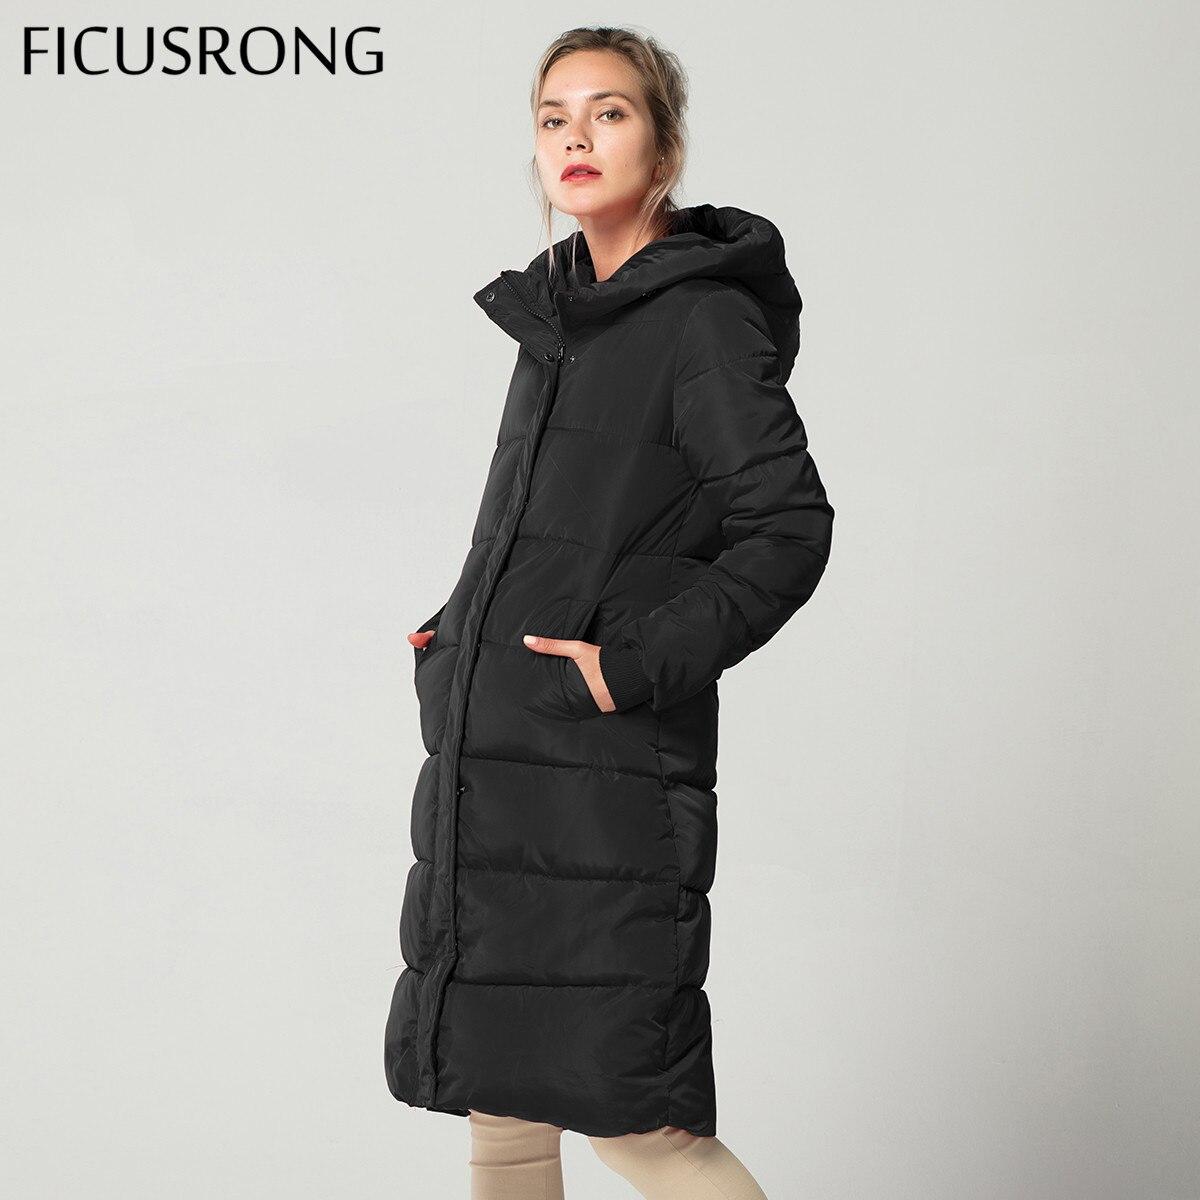 New 2018 Causal Winter   Jacket   Women Thick Warm Coat Female   Basic     Jacket   Women Slim Zipper Hooded Coat Tops Outwear FICUSRONG